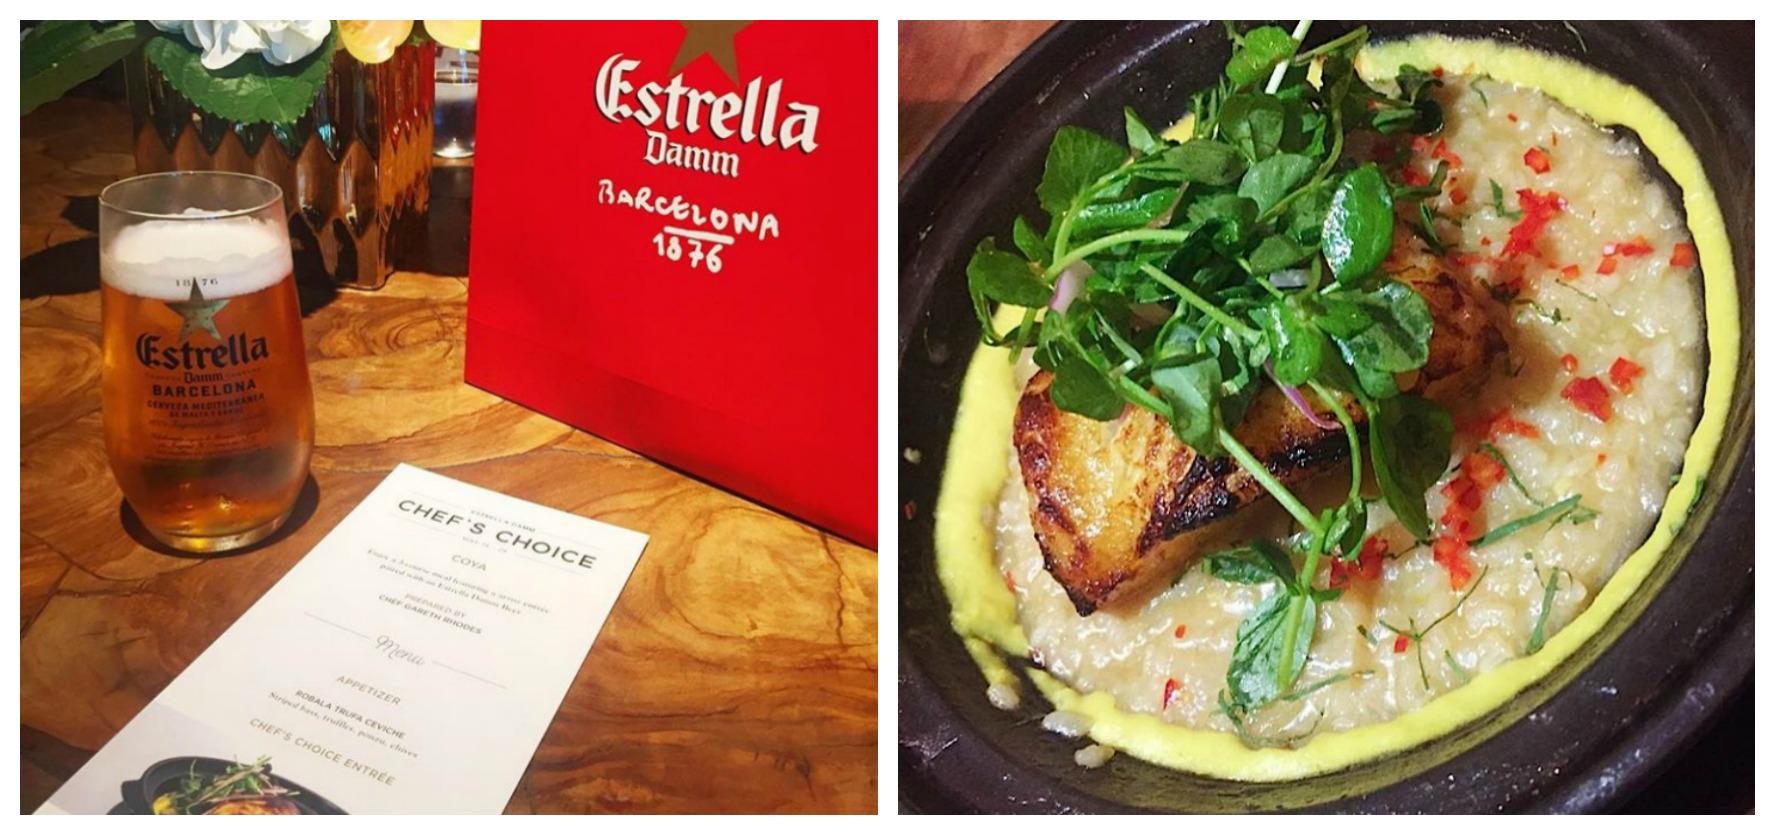 Estrella Damm Miami Coya Chef's Choice